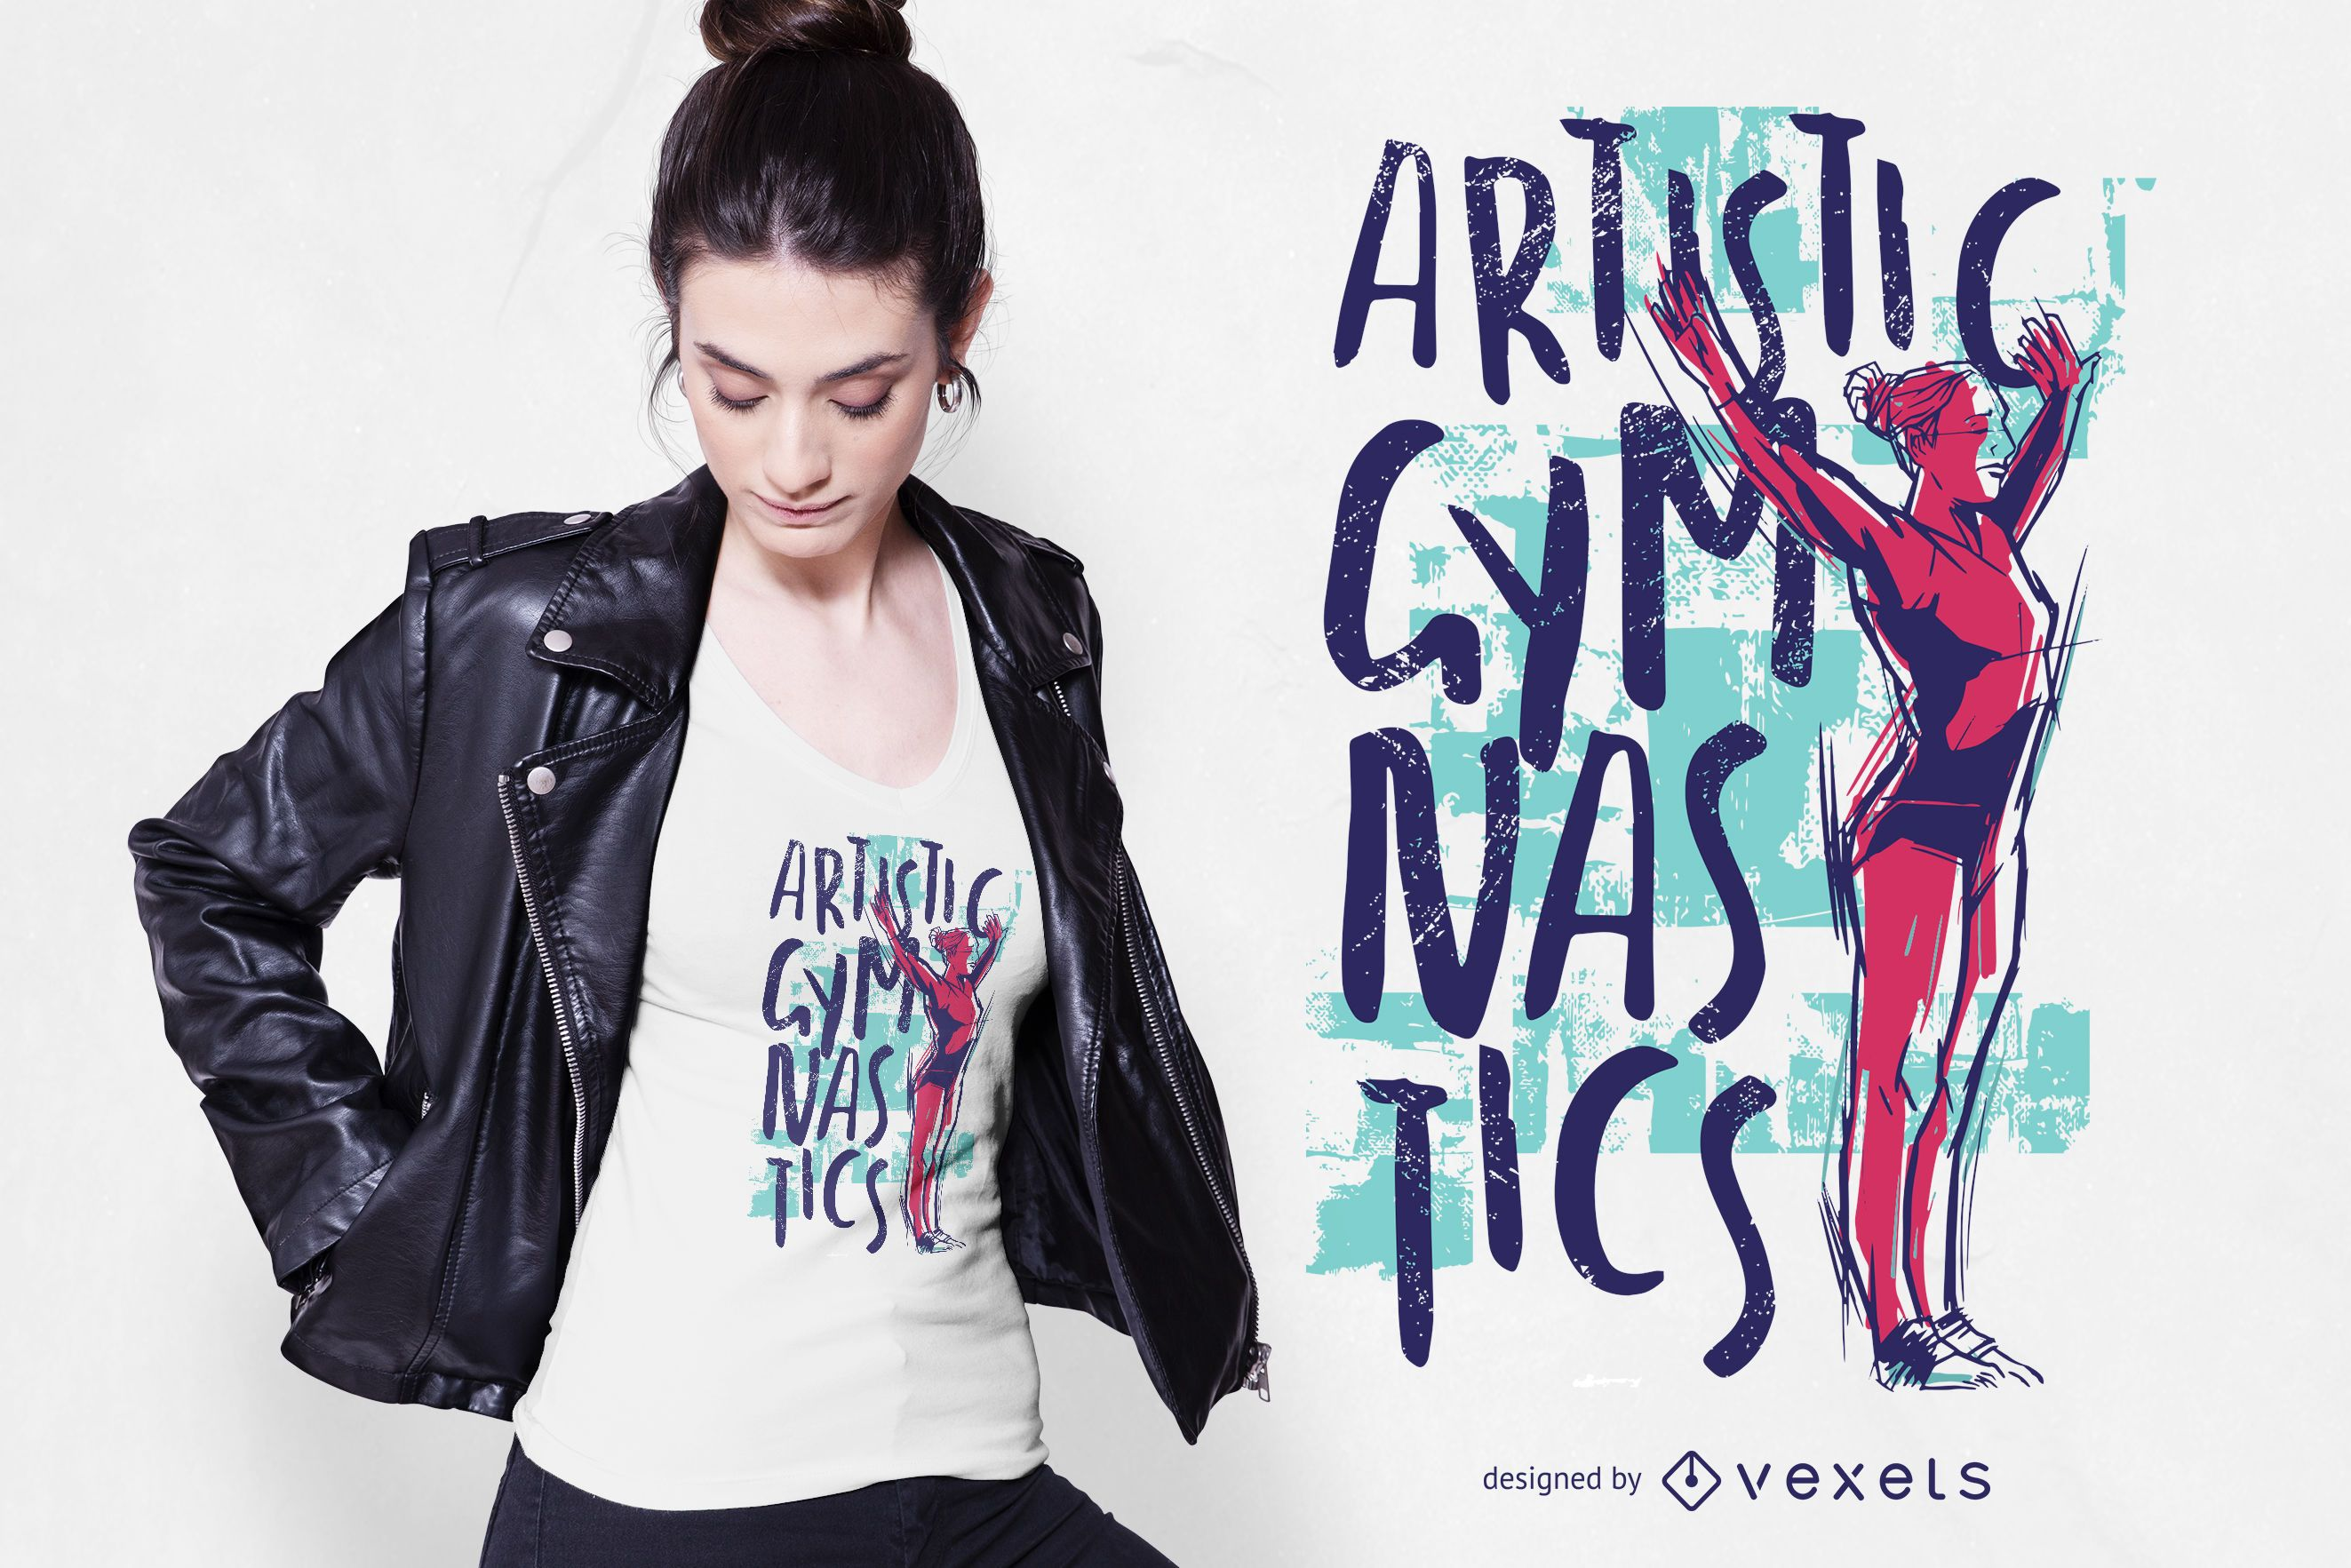 Artistic Gymnast T-shirt Design